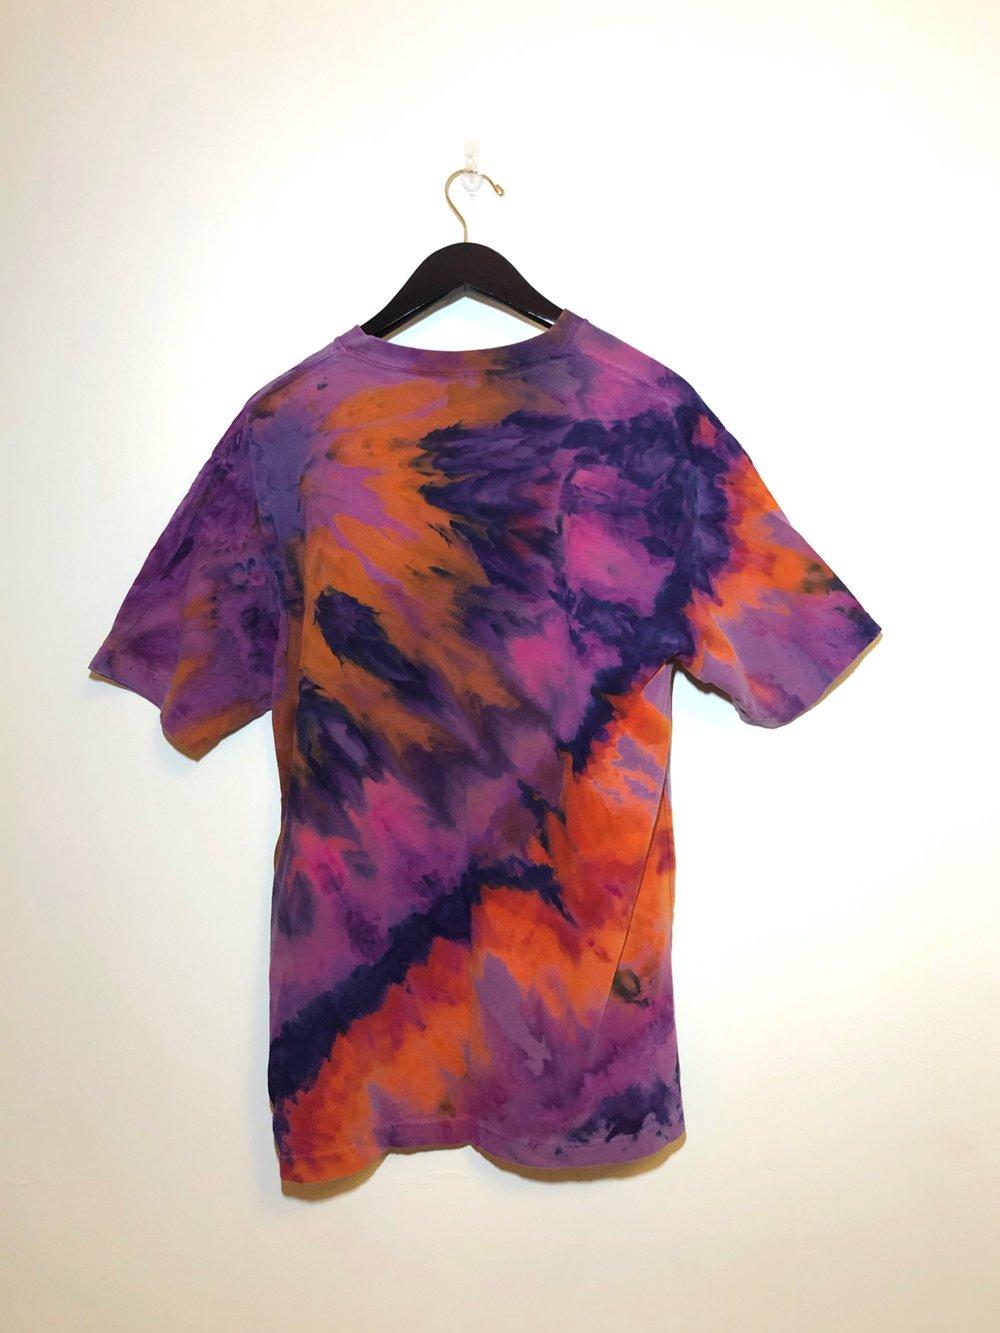 Shirt #8 - Medium